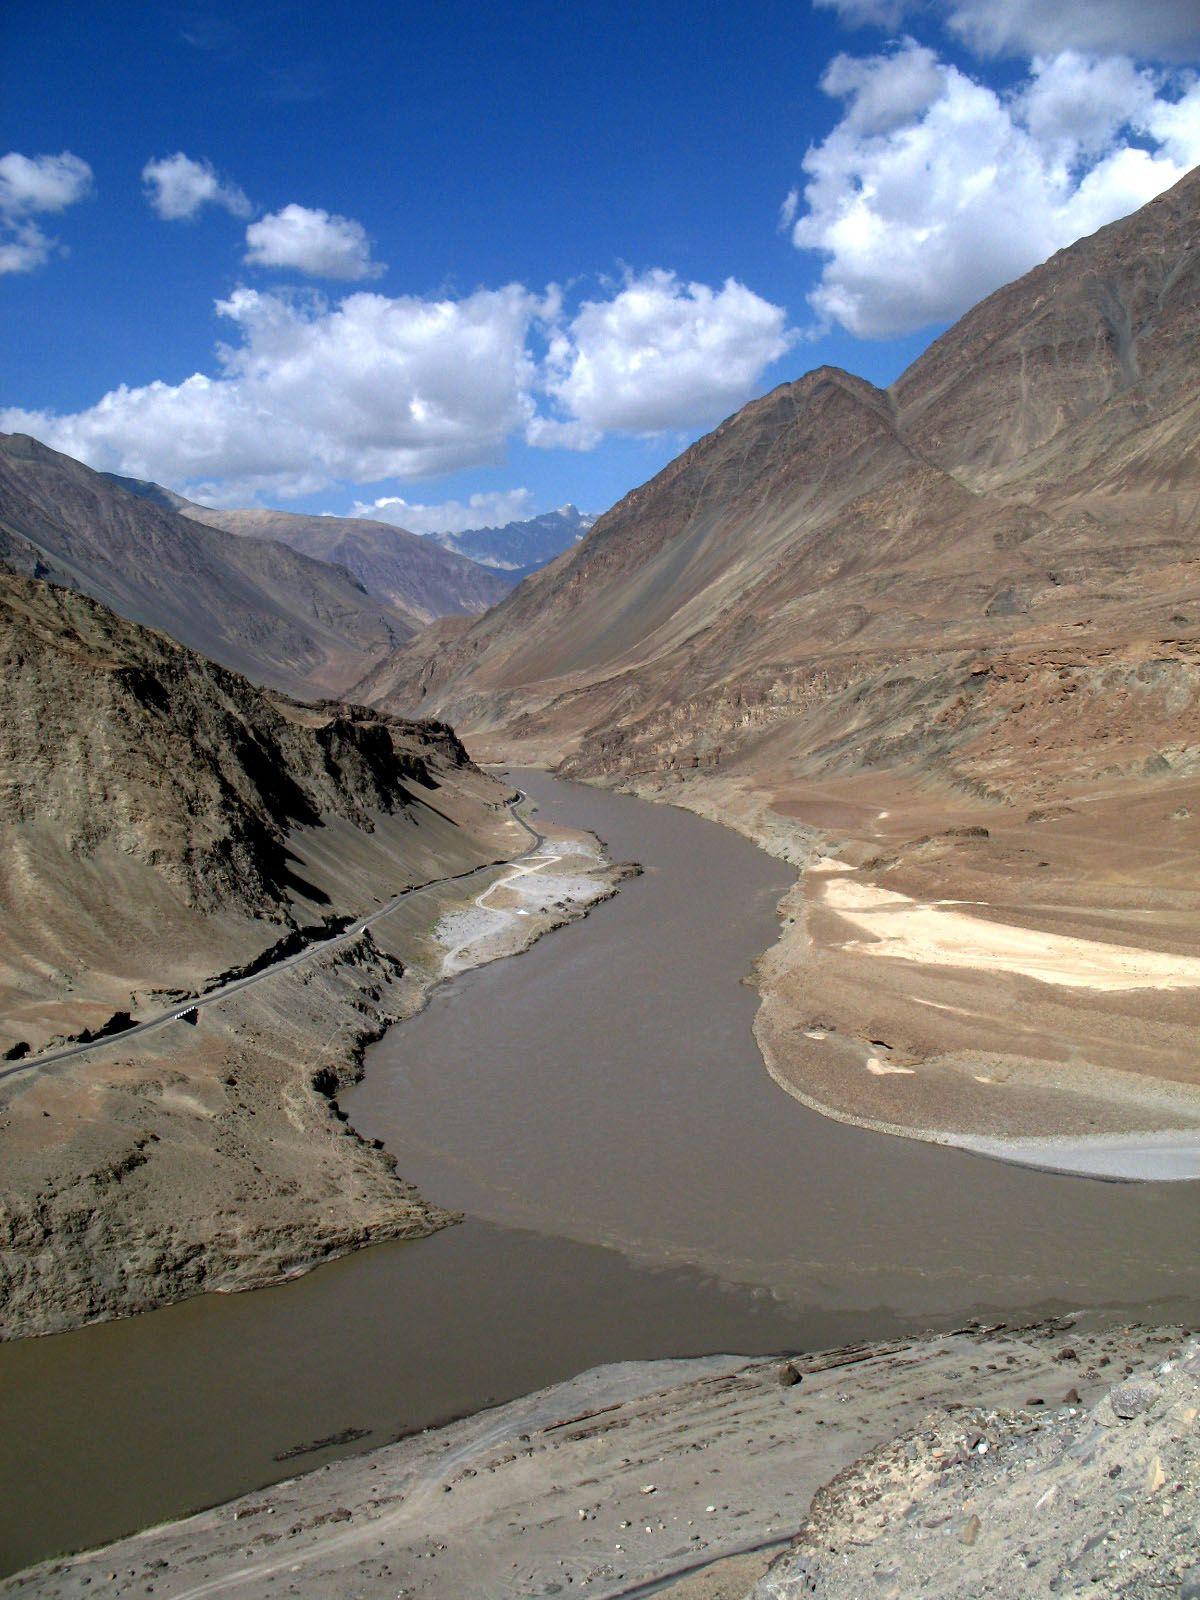 Confluence Of The Zanskar Amp Indus Rivers In Ladakh India